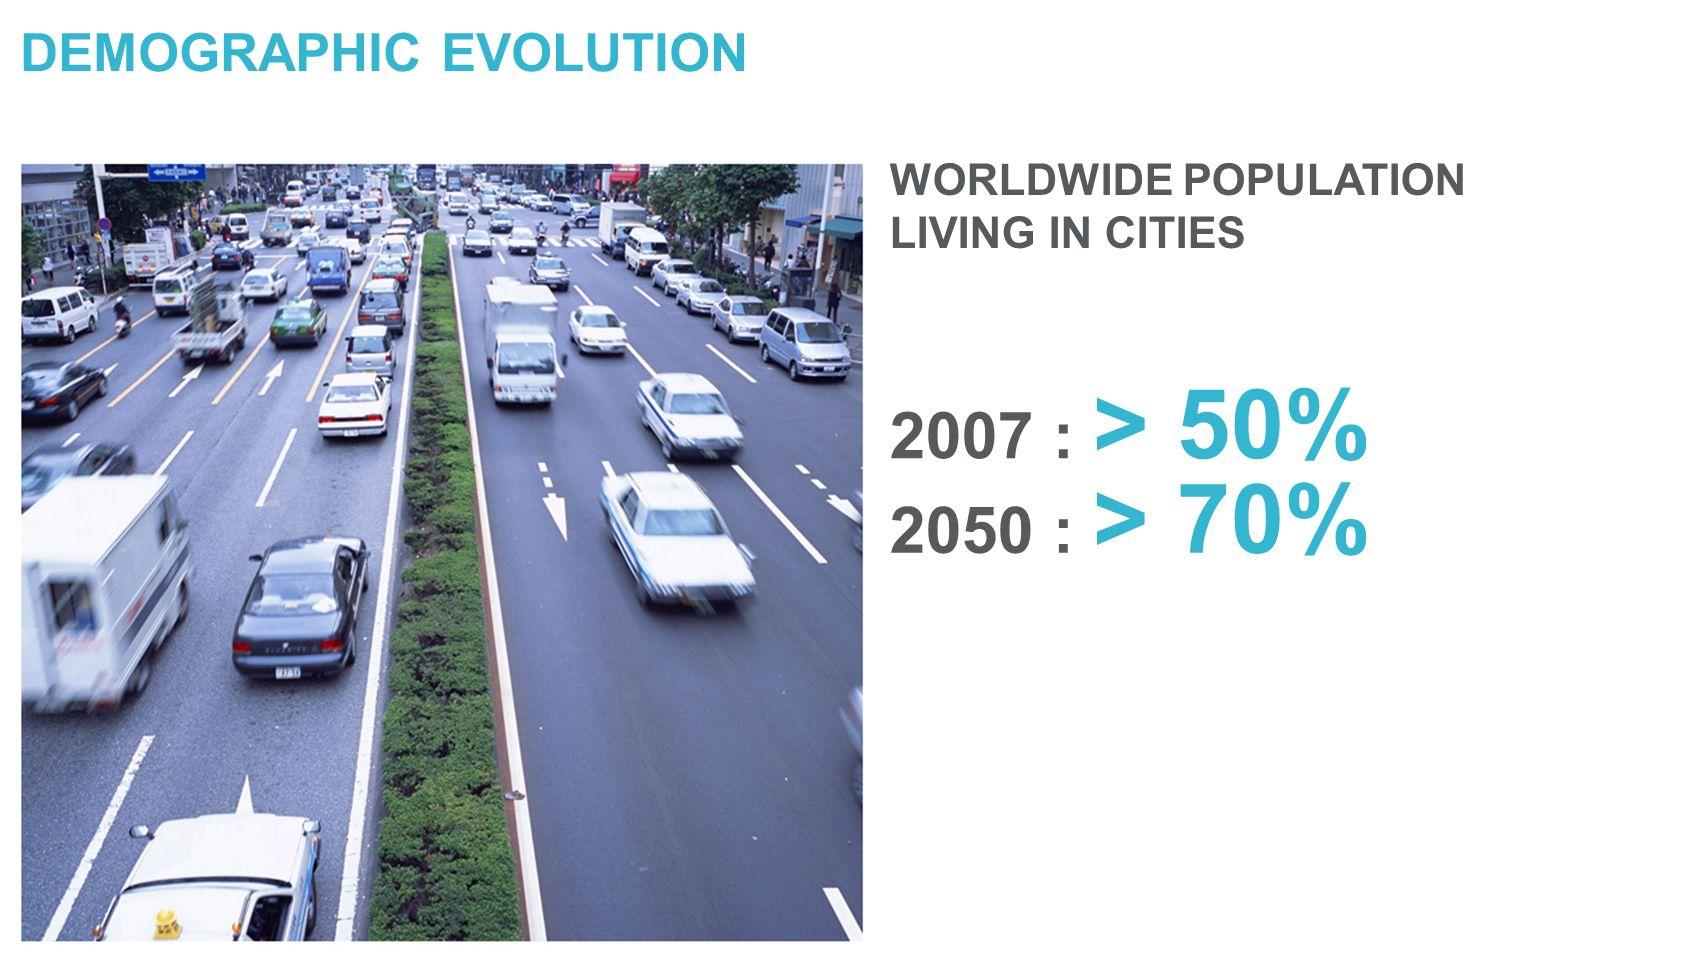 DEMOGRAPHIC EVOLUTION WORLDWIDE POPULATION LIVING IN CITIES 2007 : > 50% 2050 : > 70%